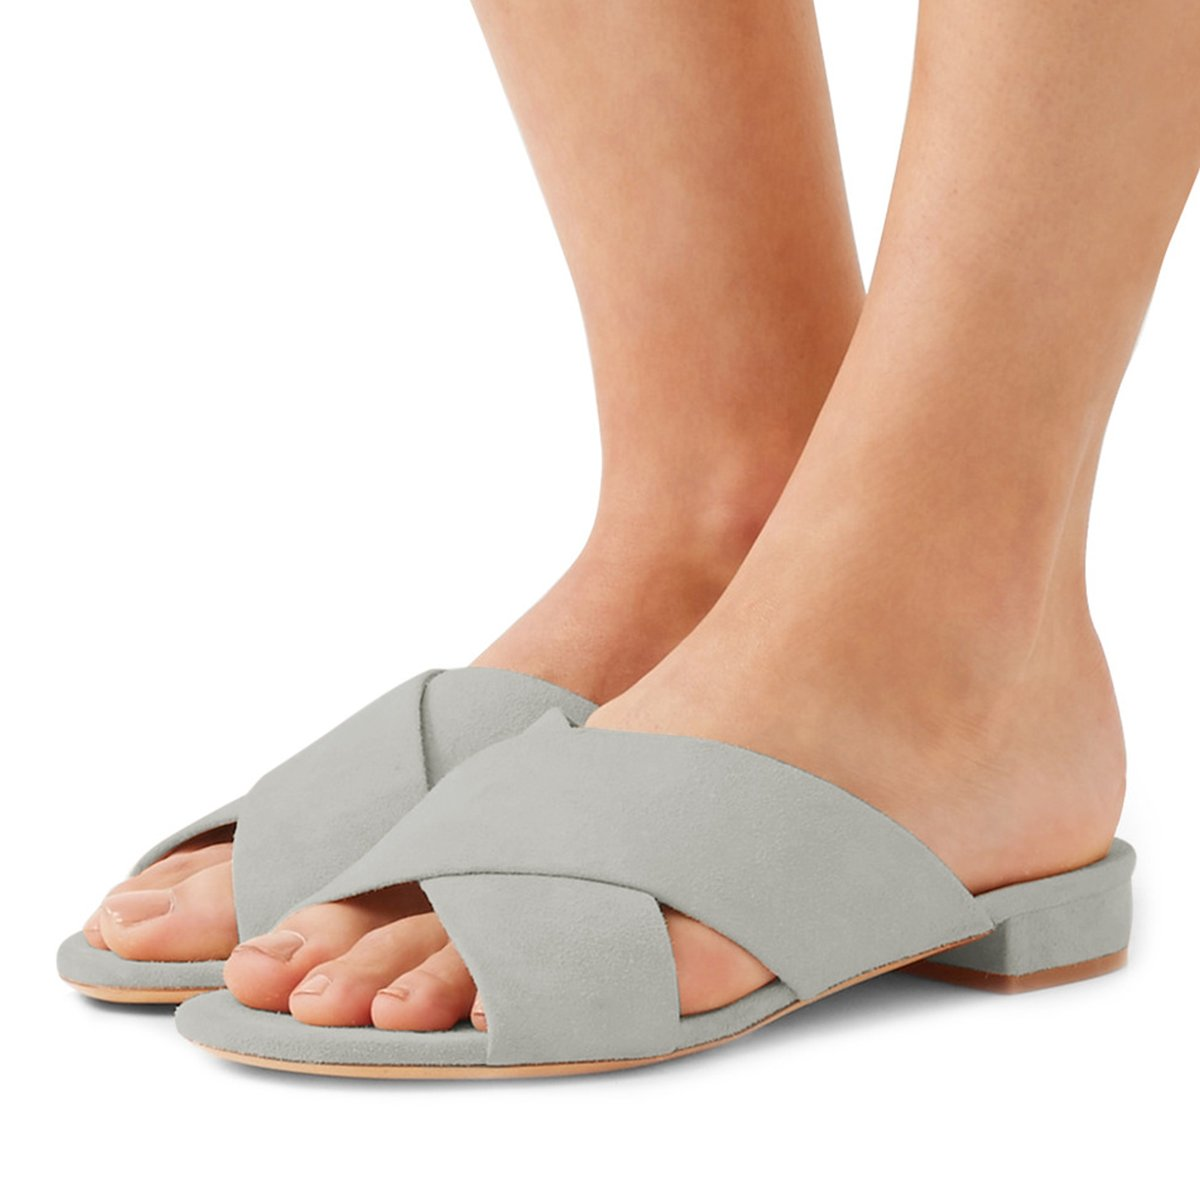 FSJ Women Comfortable Cross Strap Sandals Low Heels Mules Slide Casual Flats Shoes Size 4-15 US B07CTFDJ4H 14 B(M) US|Grey